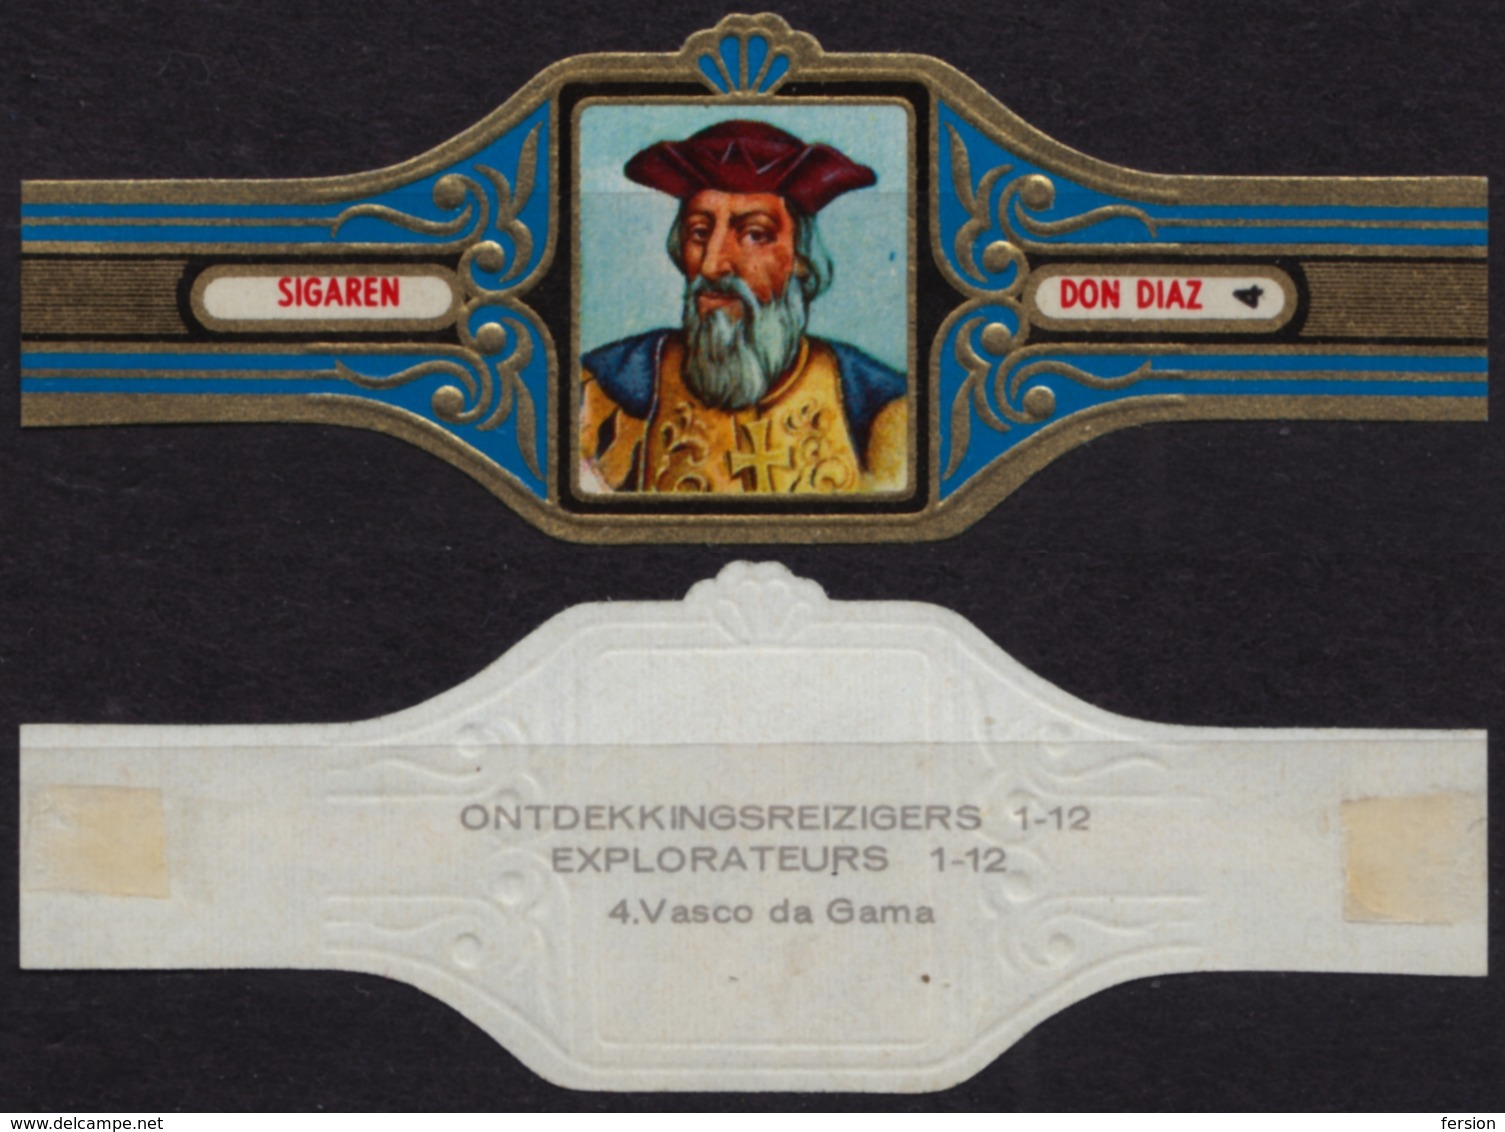 Vasco Da Gama Portugal - Explorers Ontdekkingsreizigers Belgium Belgique DON DIAZ Sigaren CIGAR CIGARS Label Vignette - Etiquettes